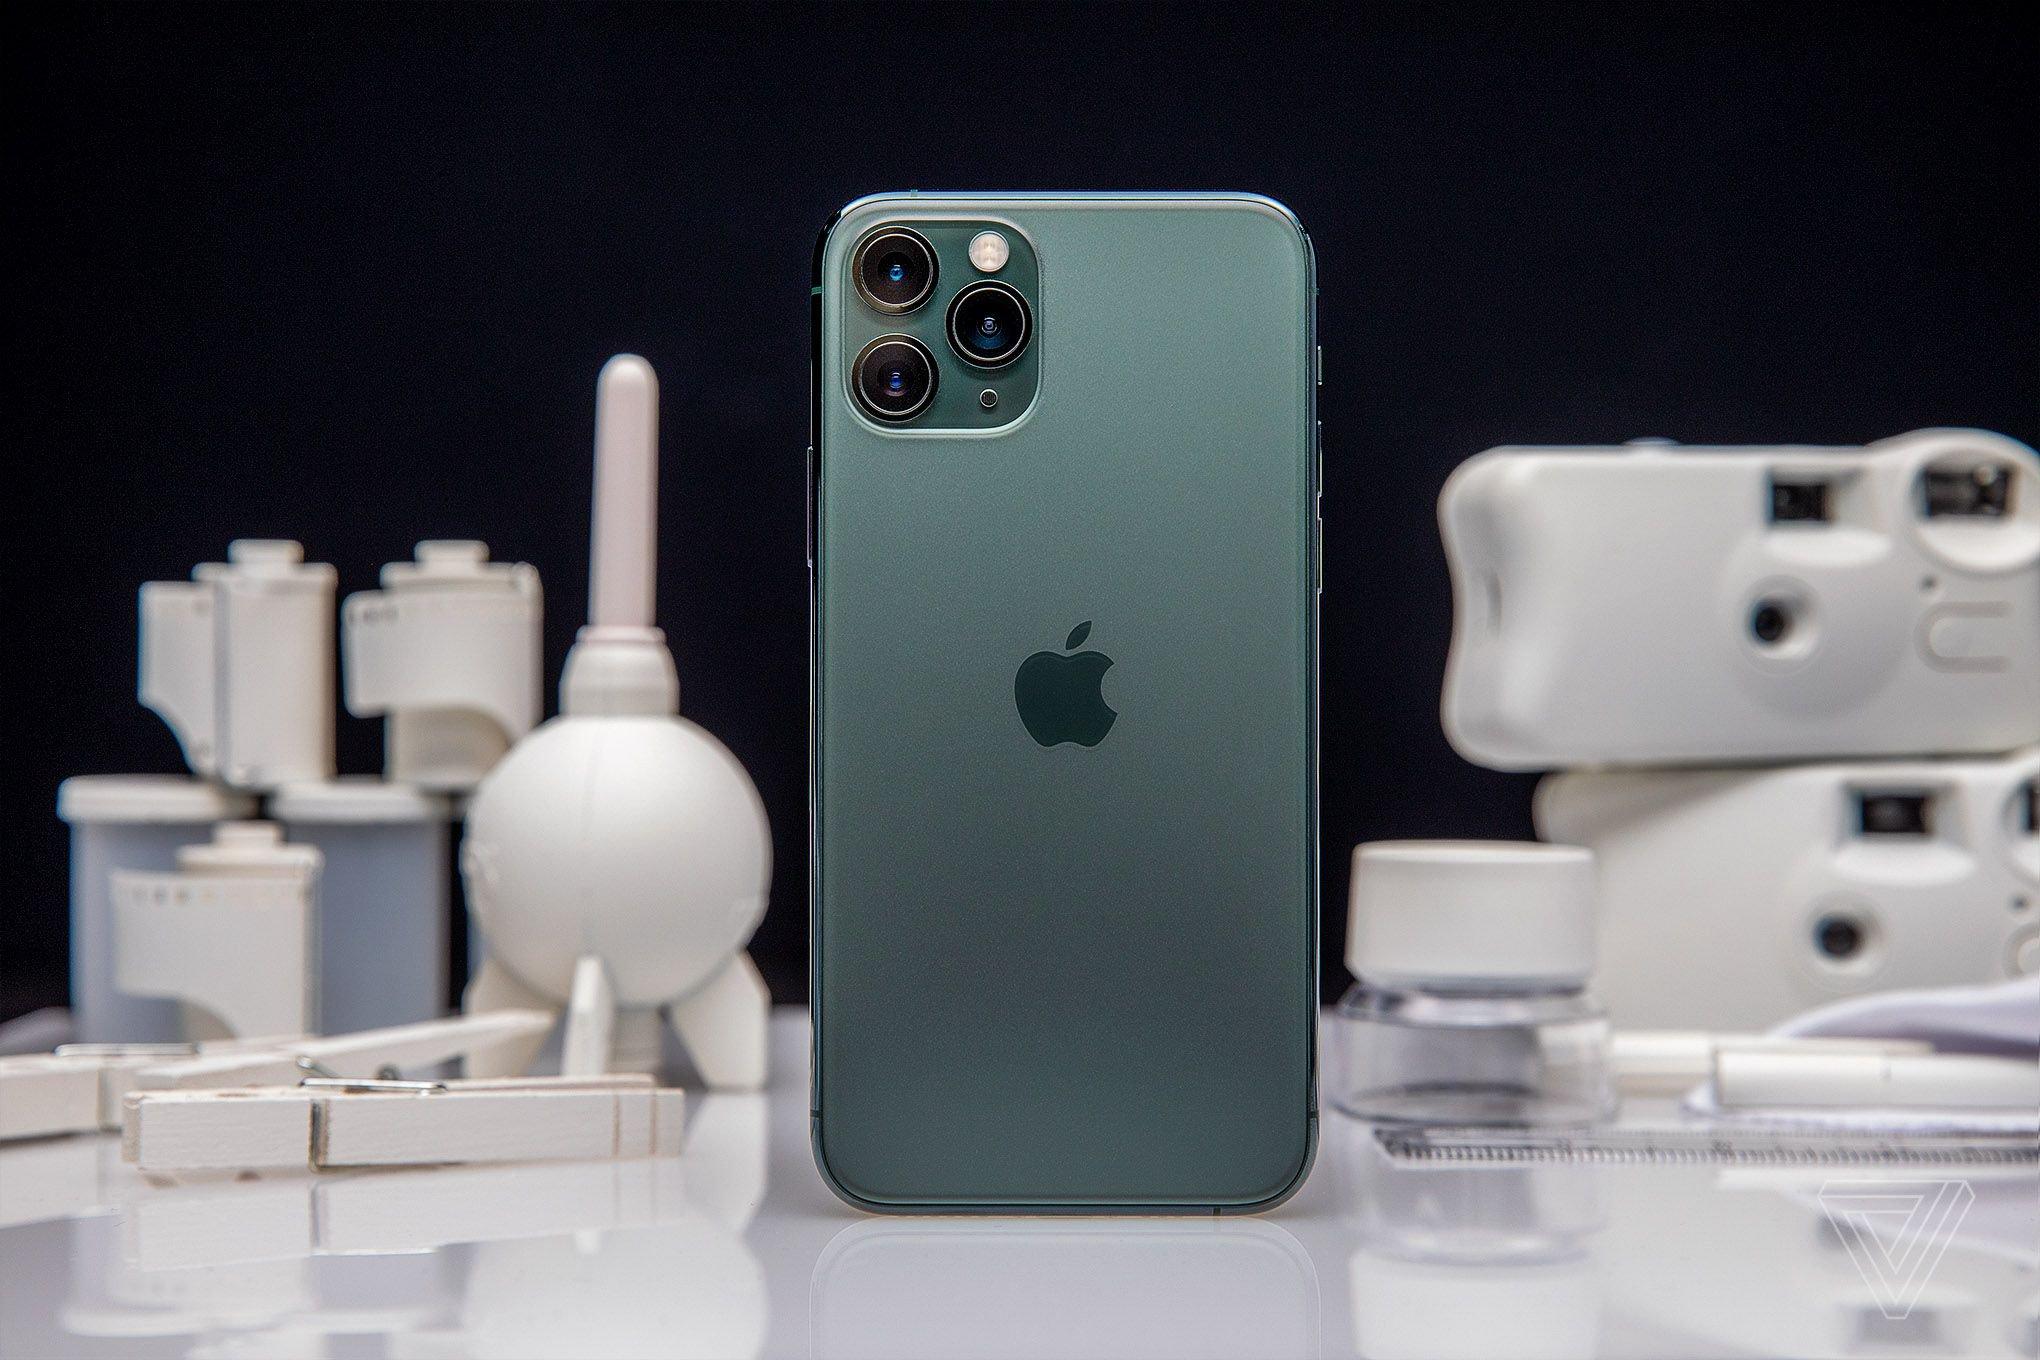 айфон 11 про макс 64 темно-зеленый